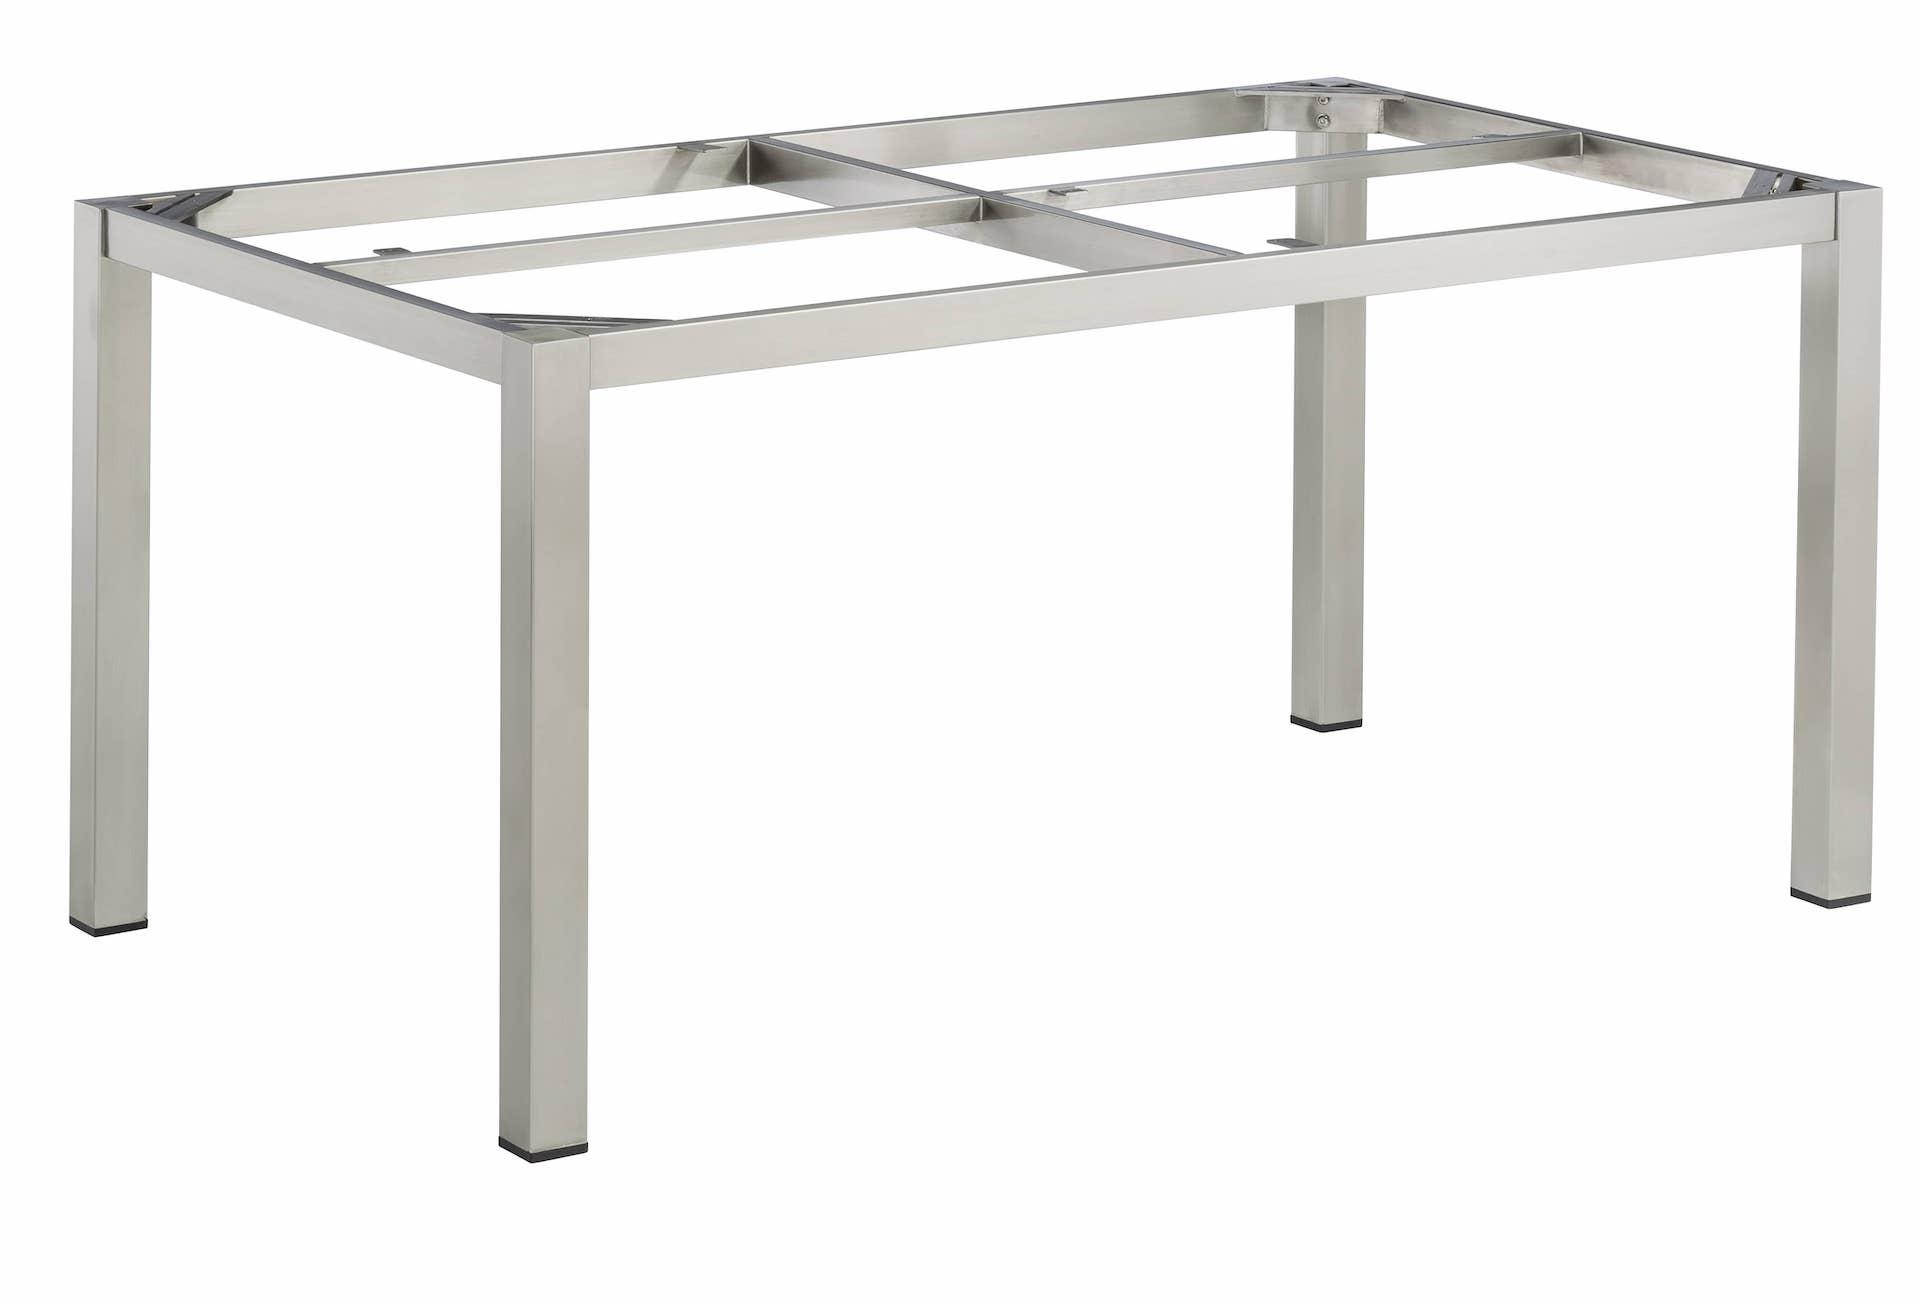 CUBIC Edelstahl Tischgestell 160 x 95 x 72 cm